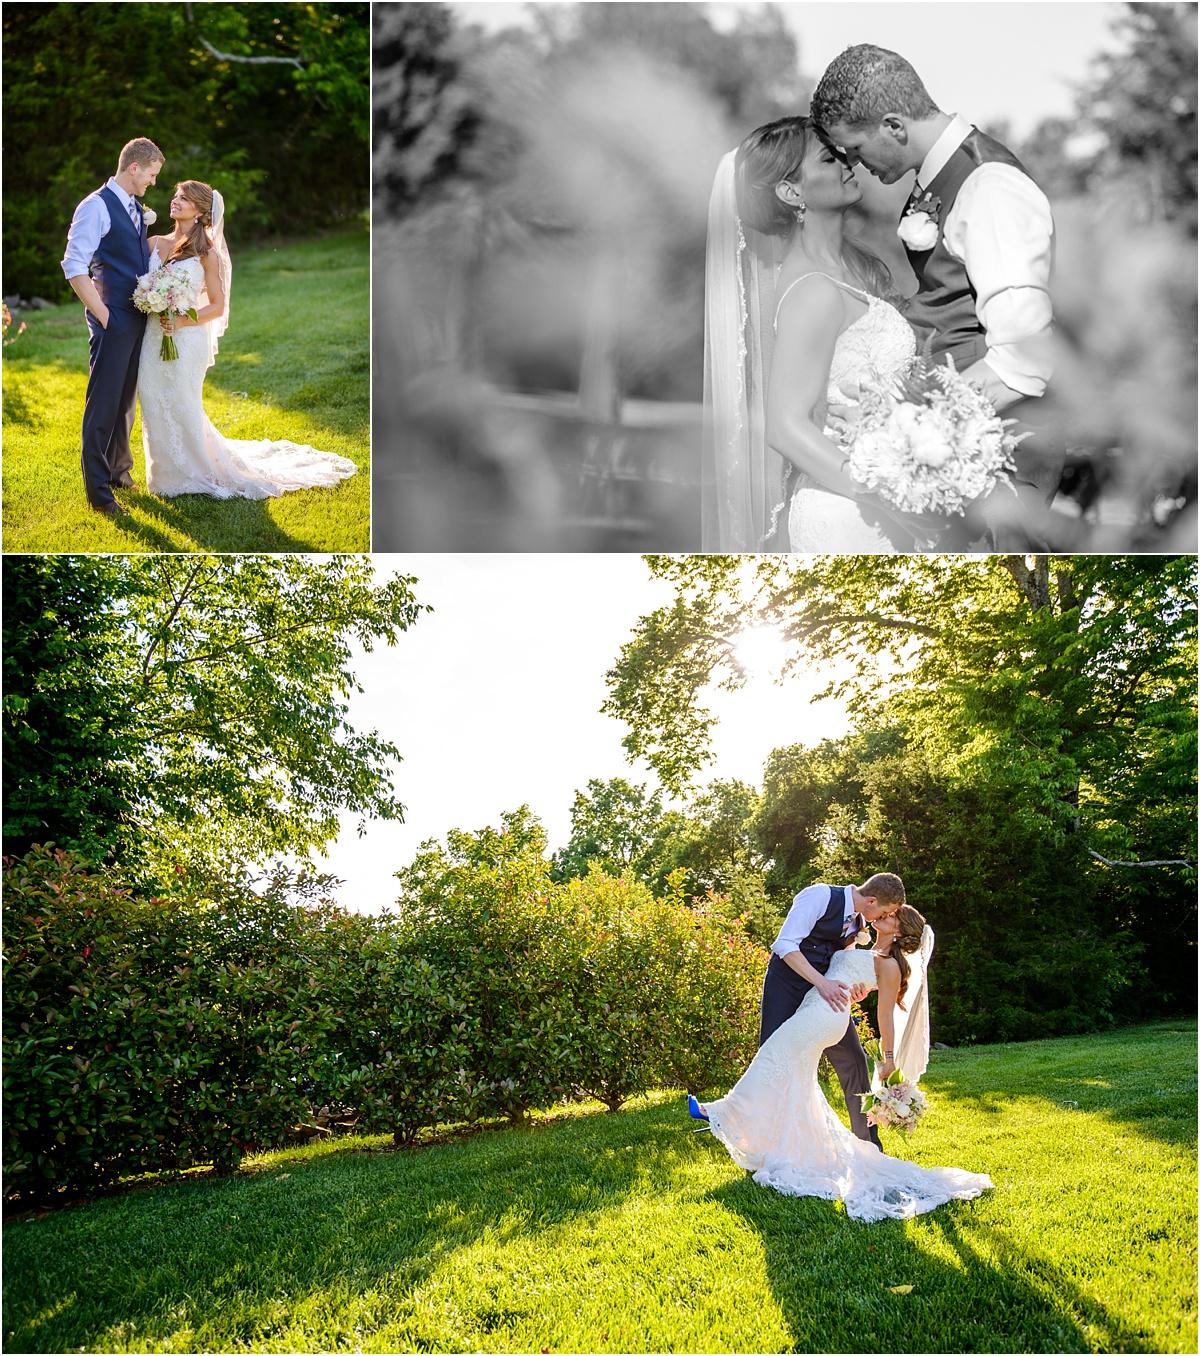 Greg Smit Photography Nashville wedding photographer Cedarwood Weddings_0047